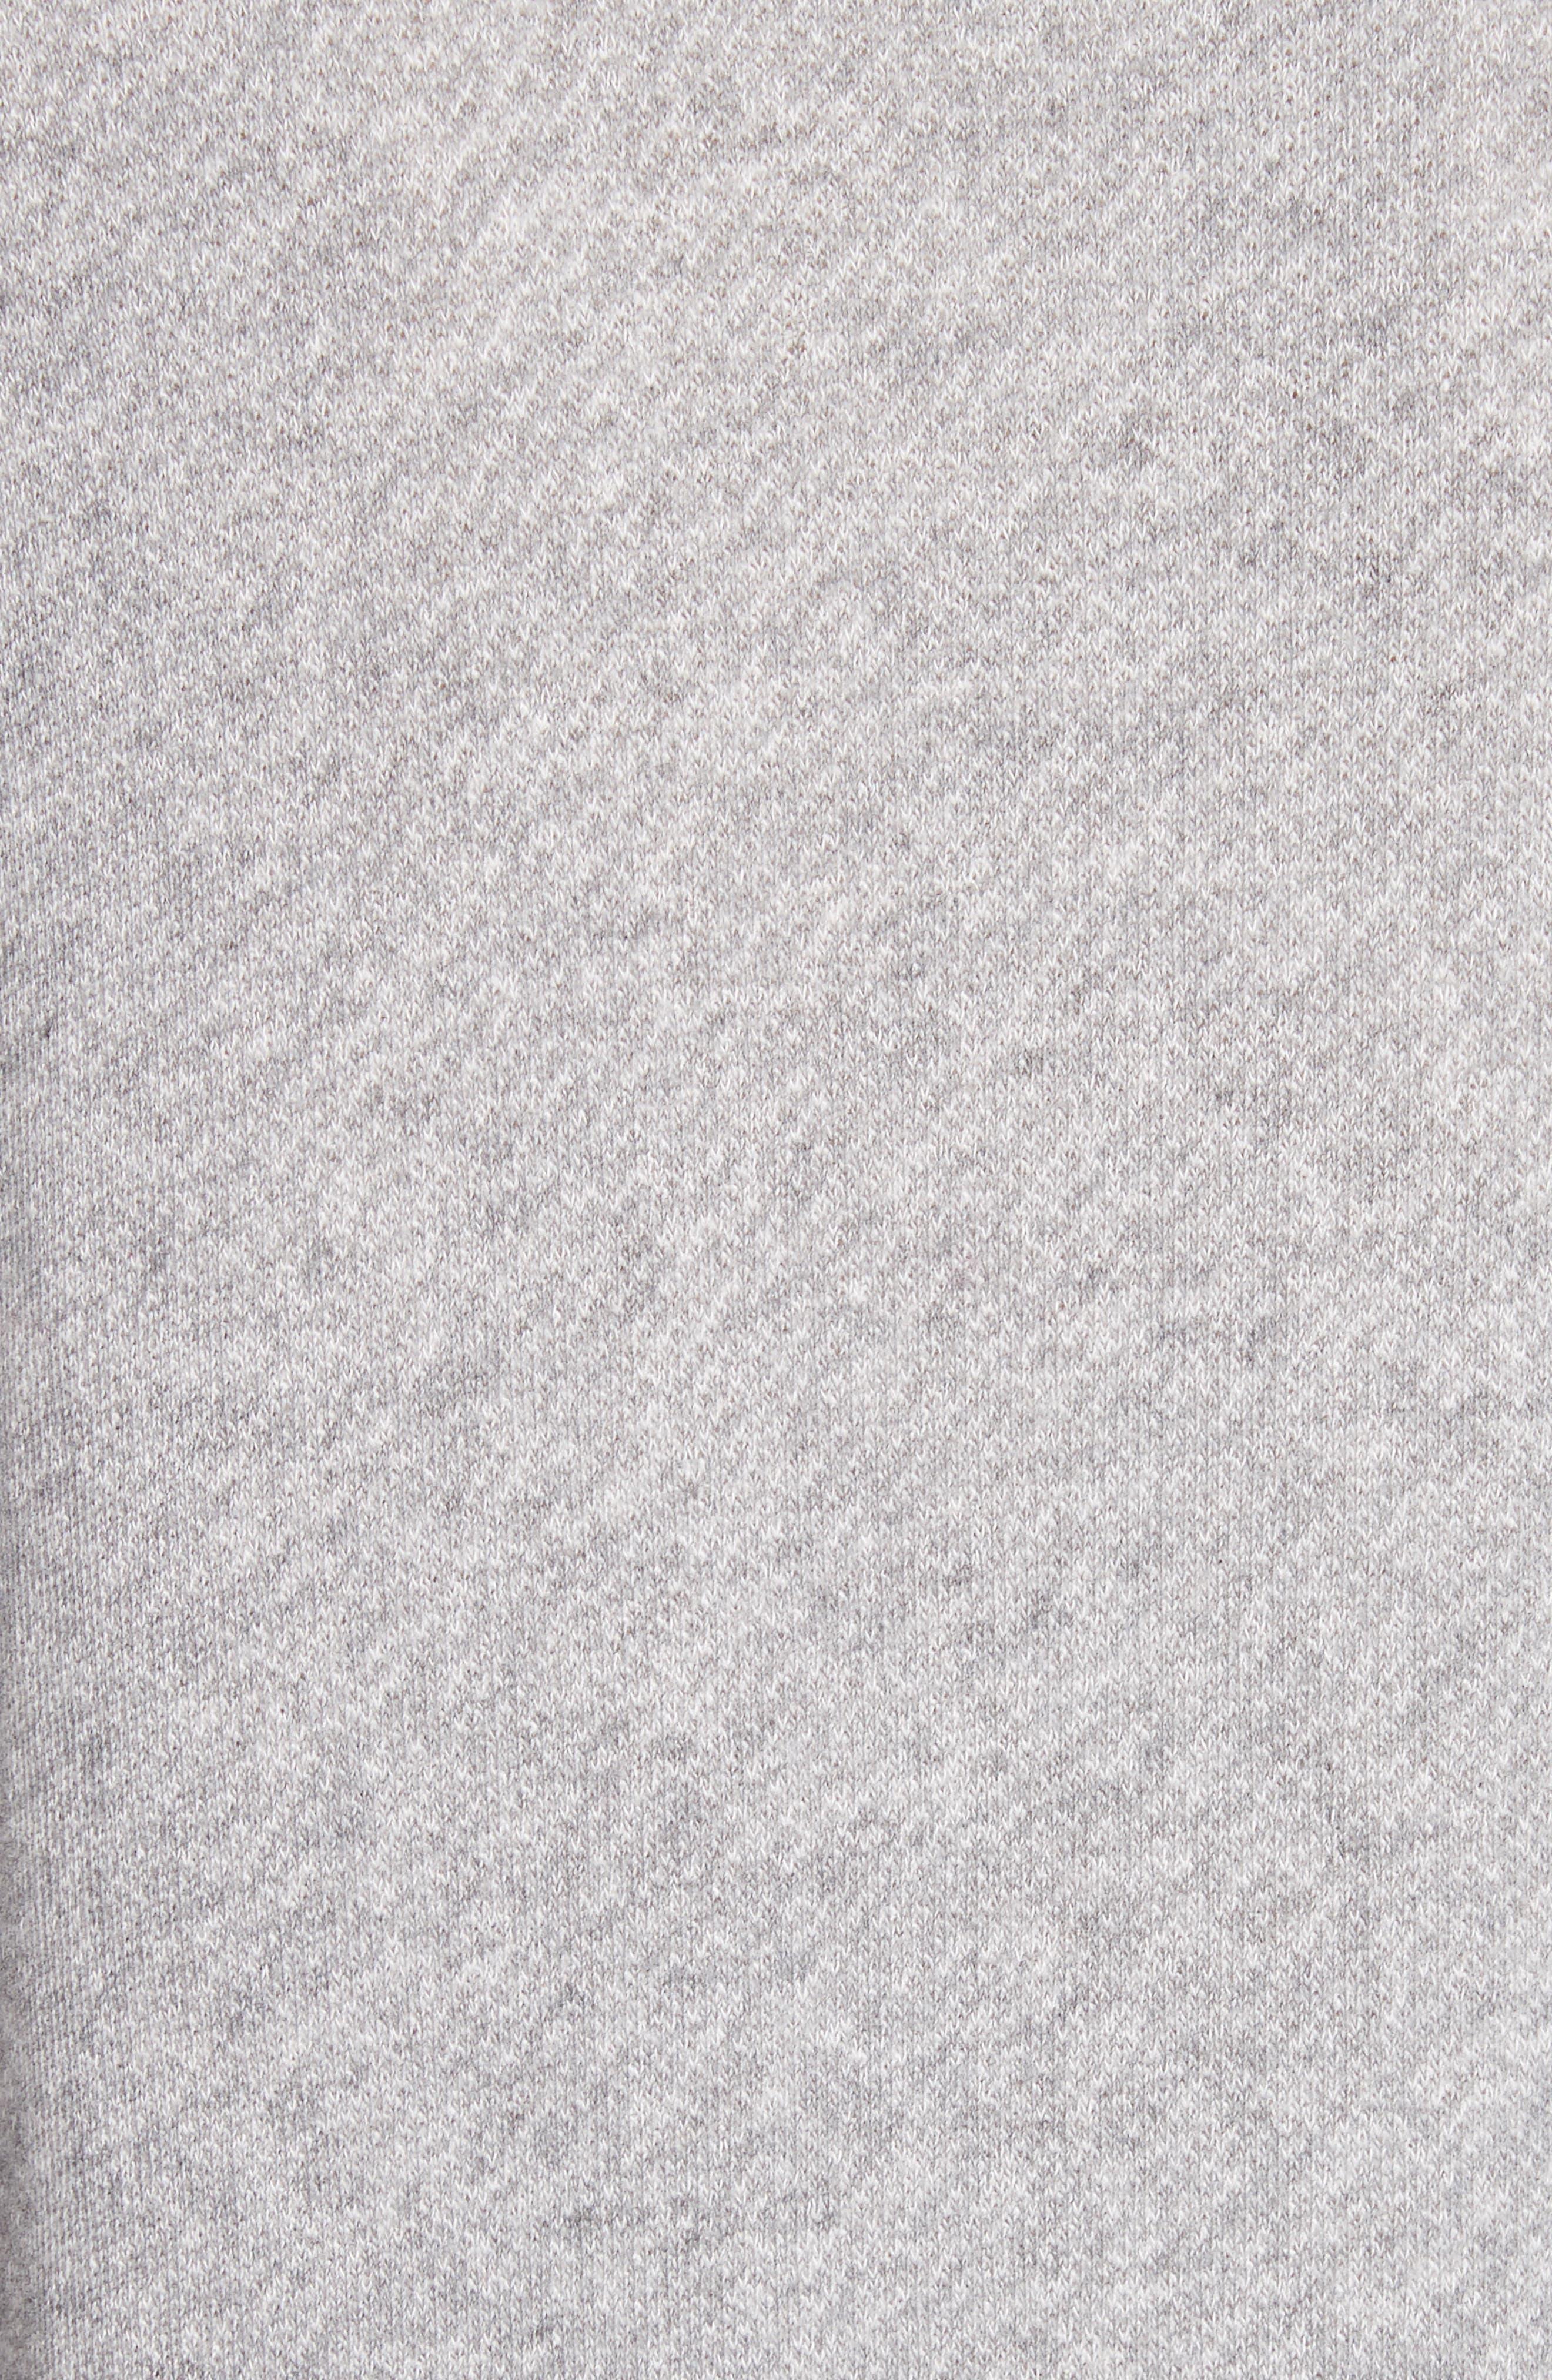 Richardine B Sweatshirt,                             Alternate thumbnail 5, color,                             Heather Grey